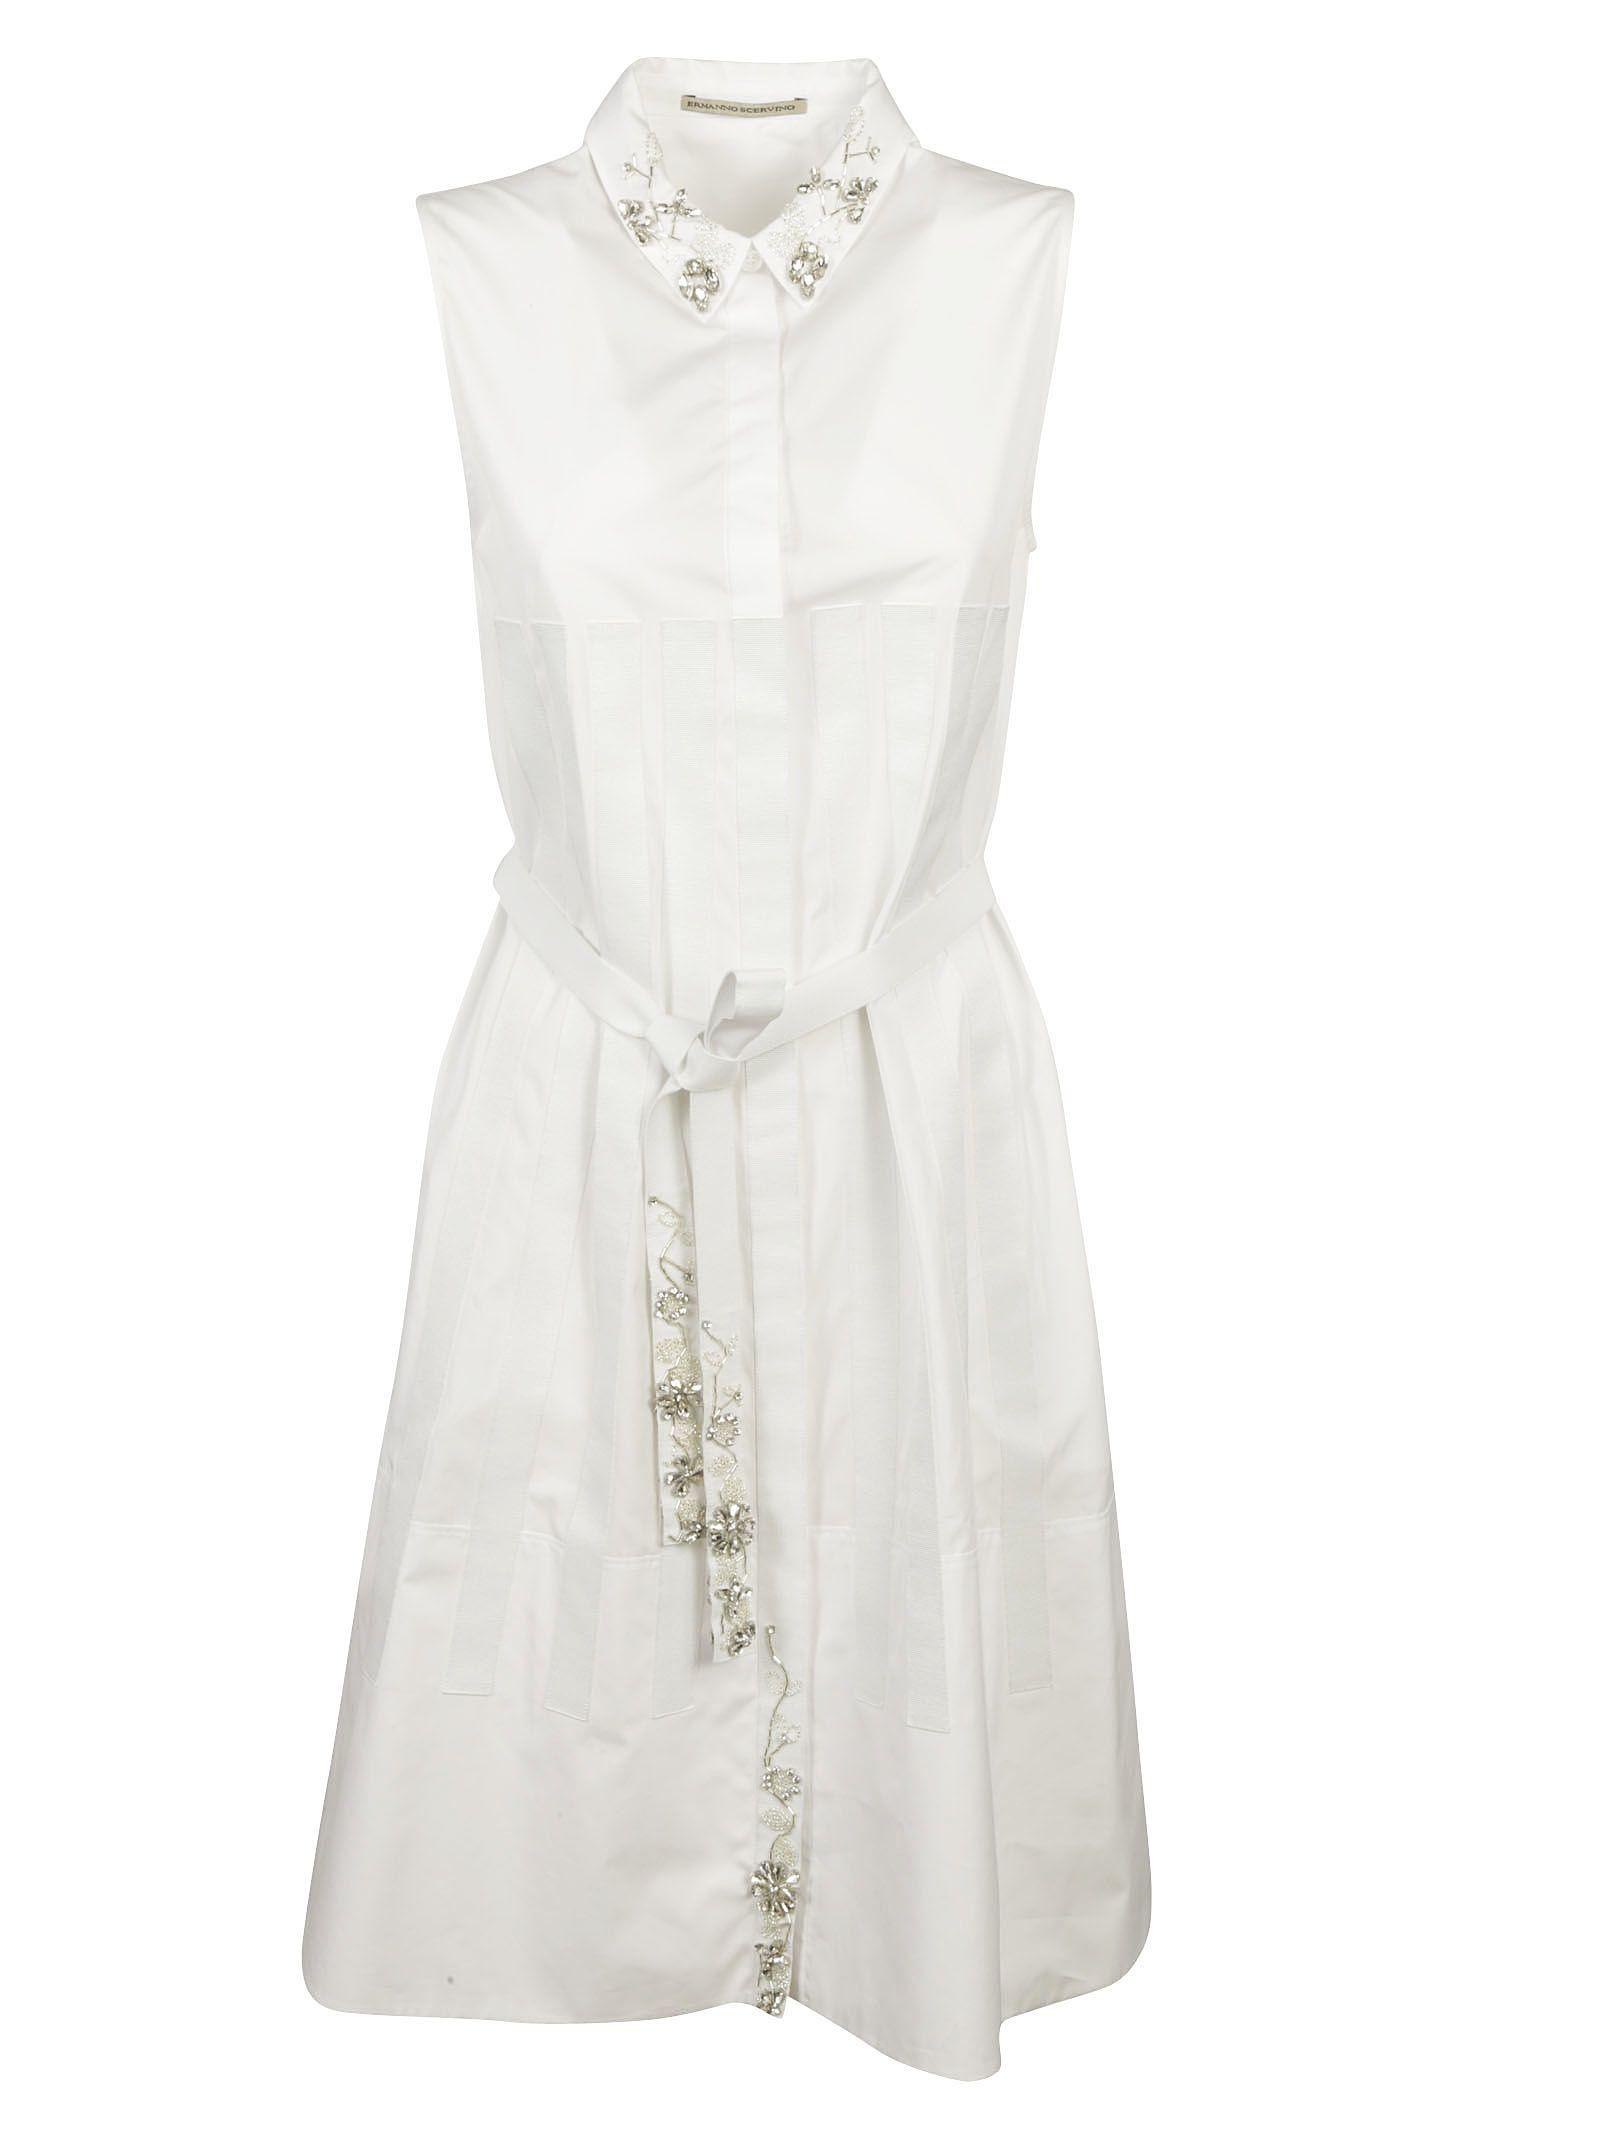 Ermanno Scervino Sleeveless Dress